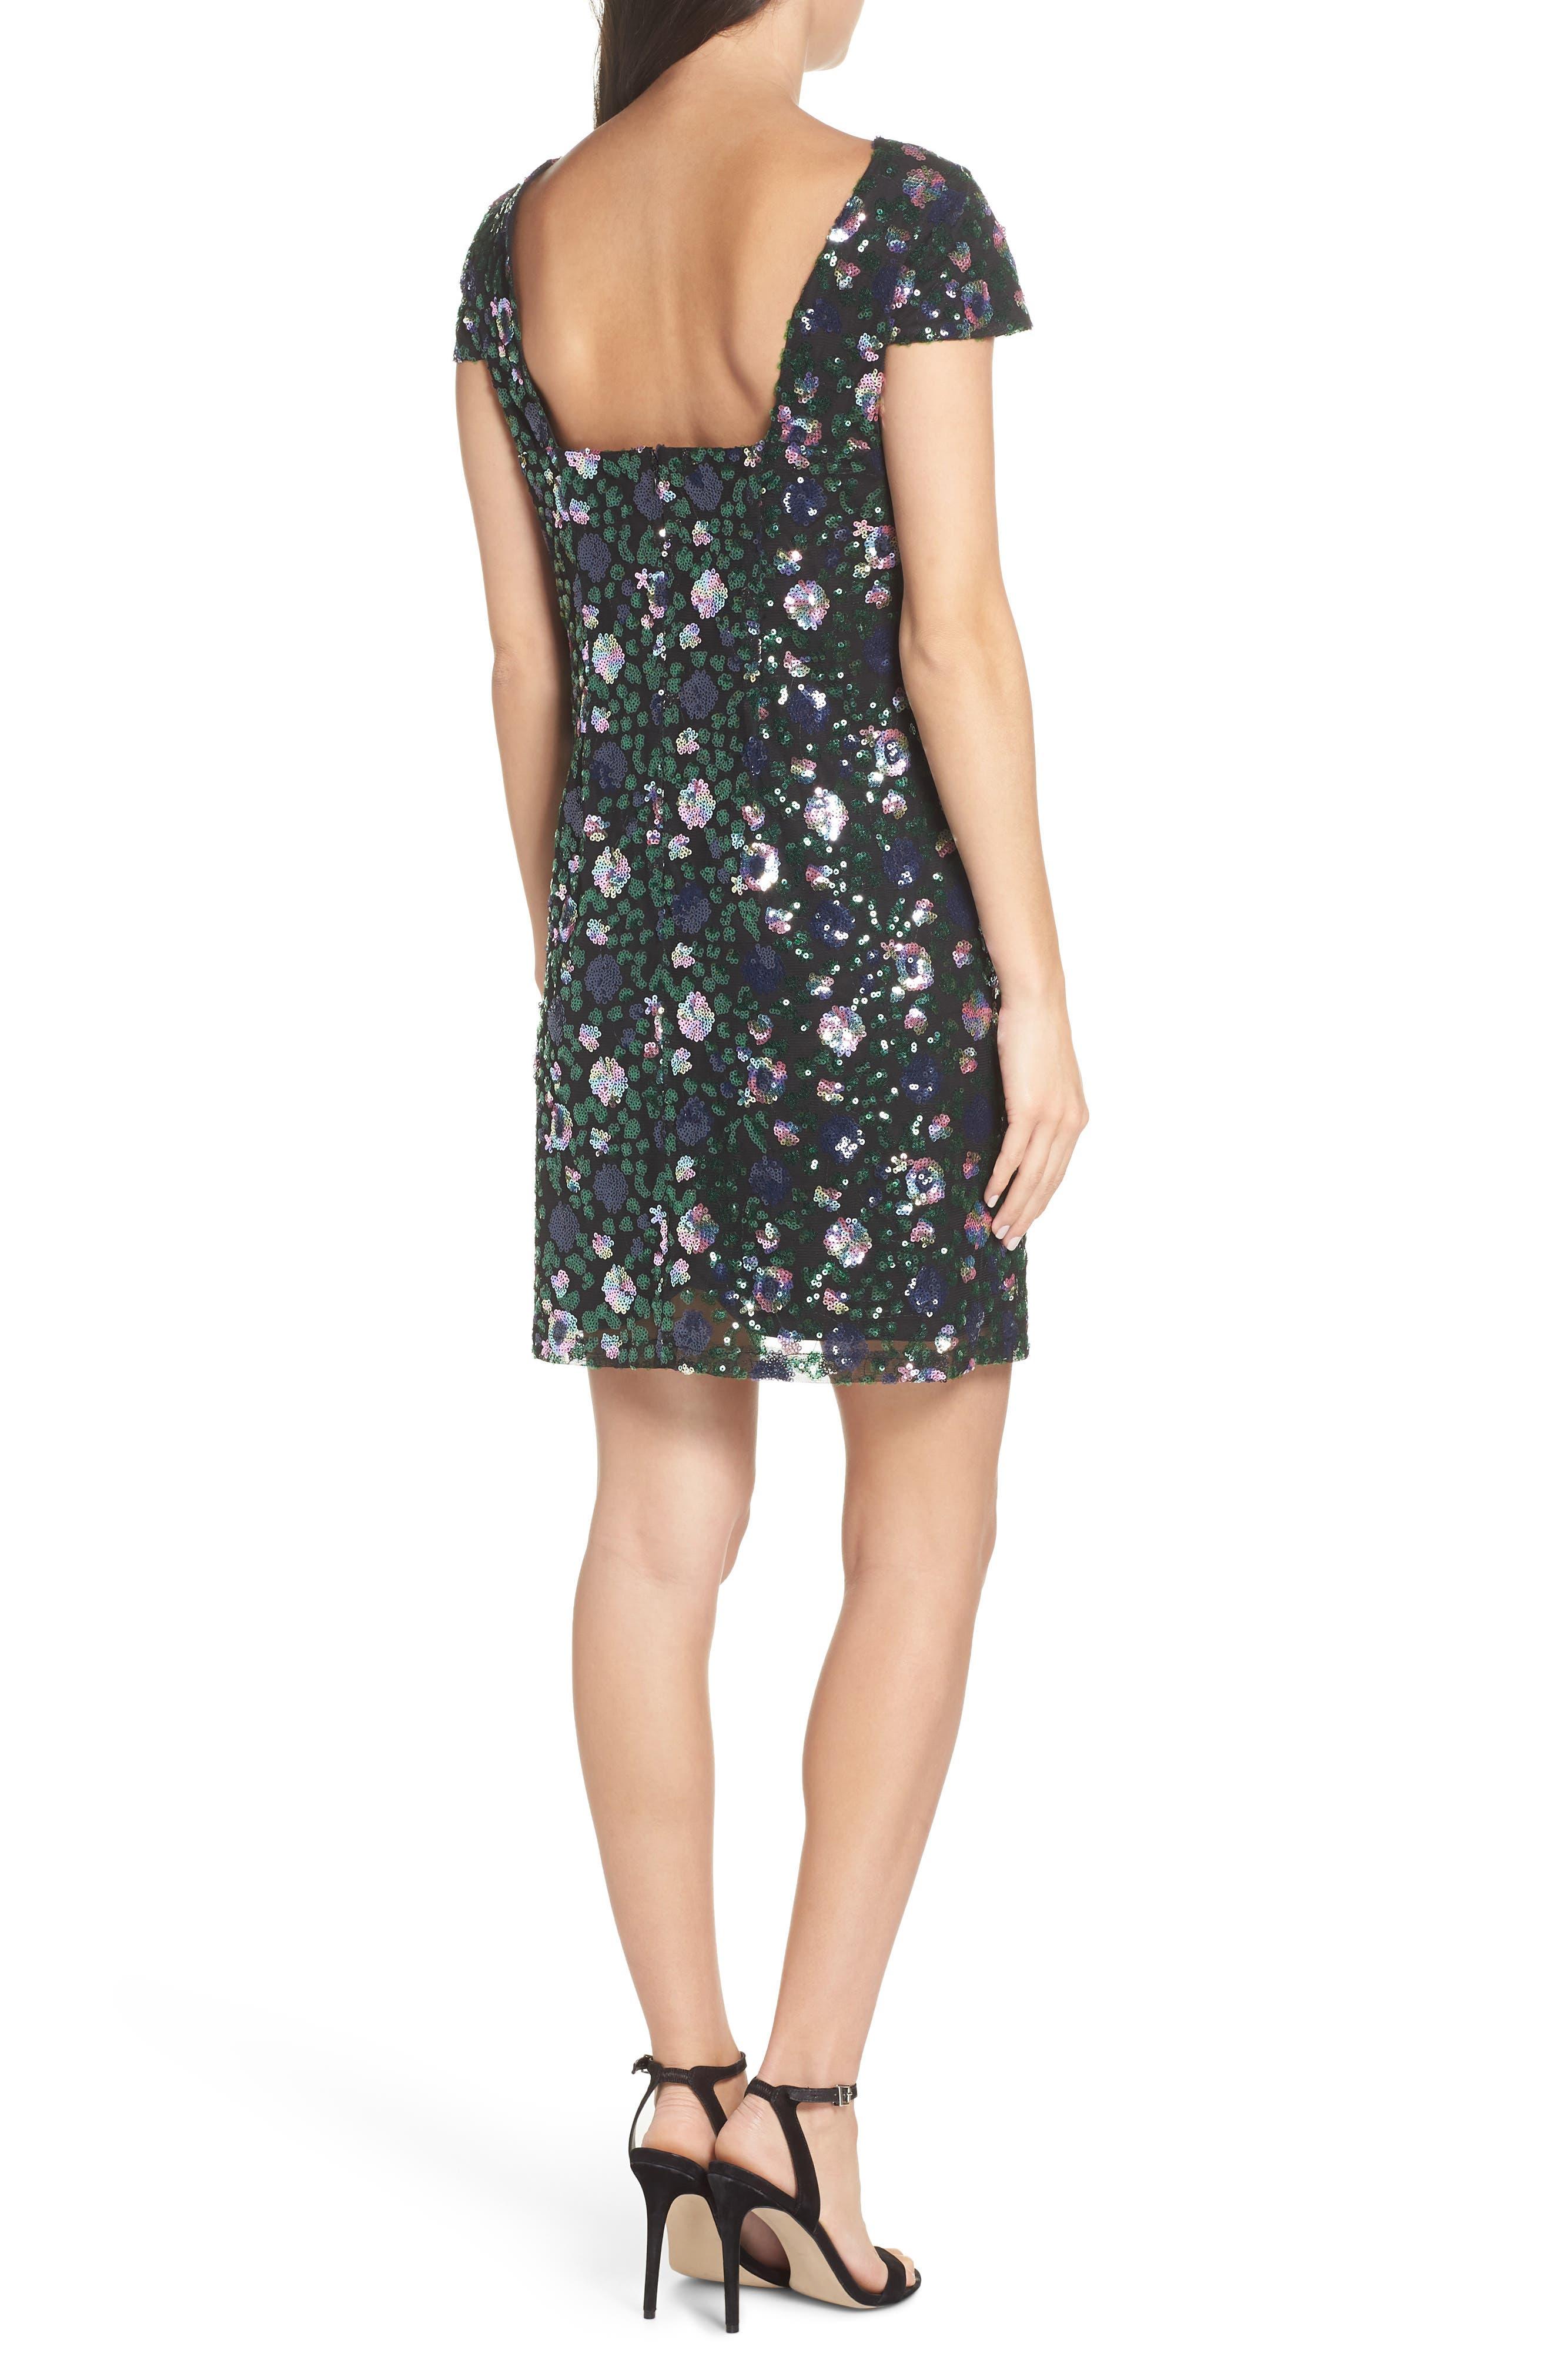 Floral Sequin Sheath Dress,                             Alternate thumbnail 2, color,                             PURPLE/ GREEN